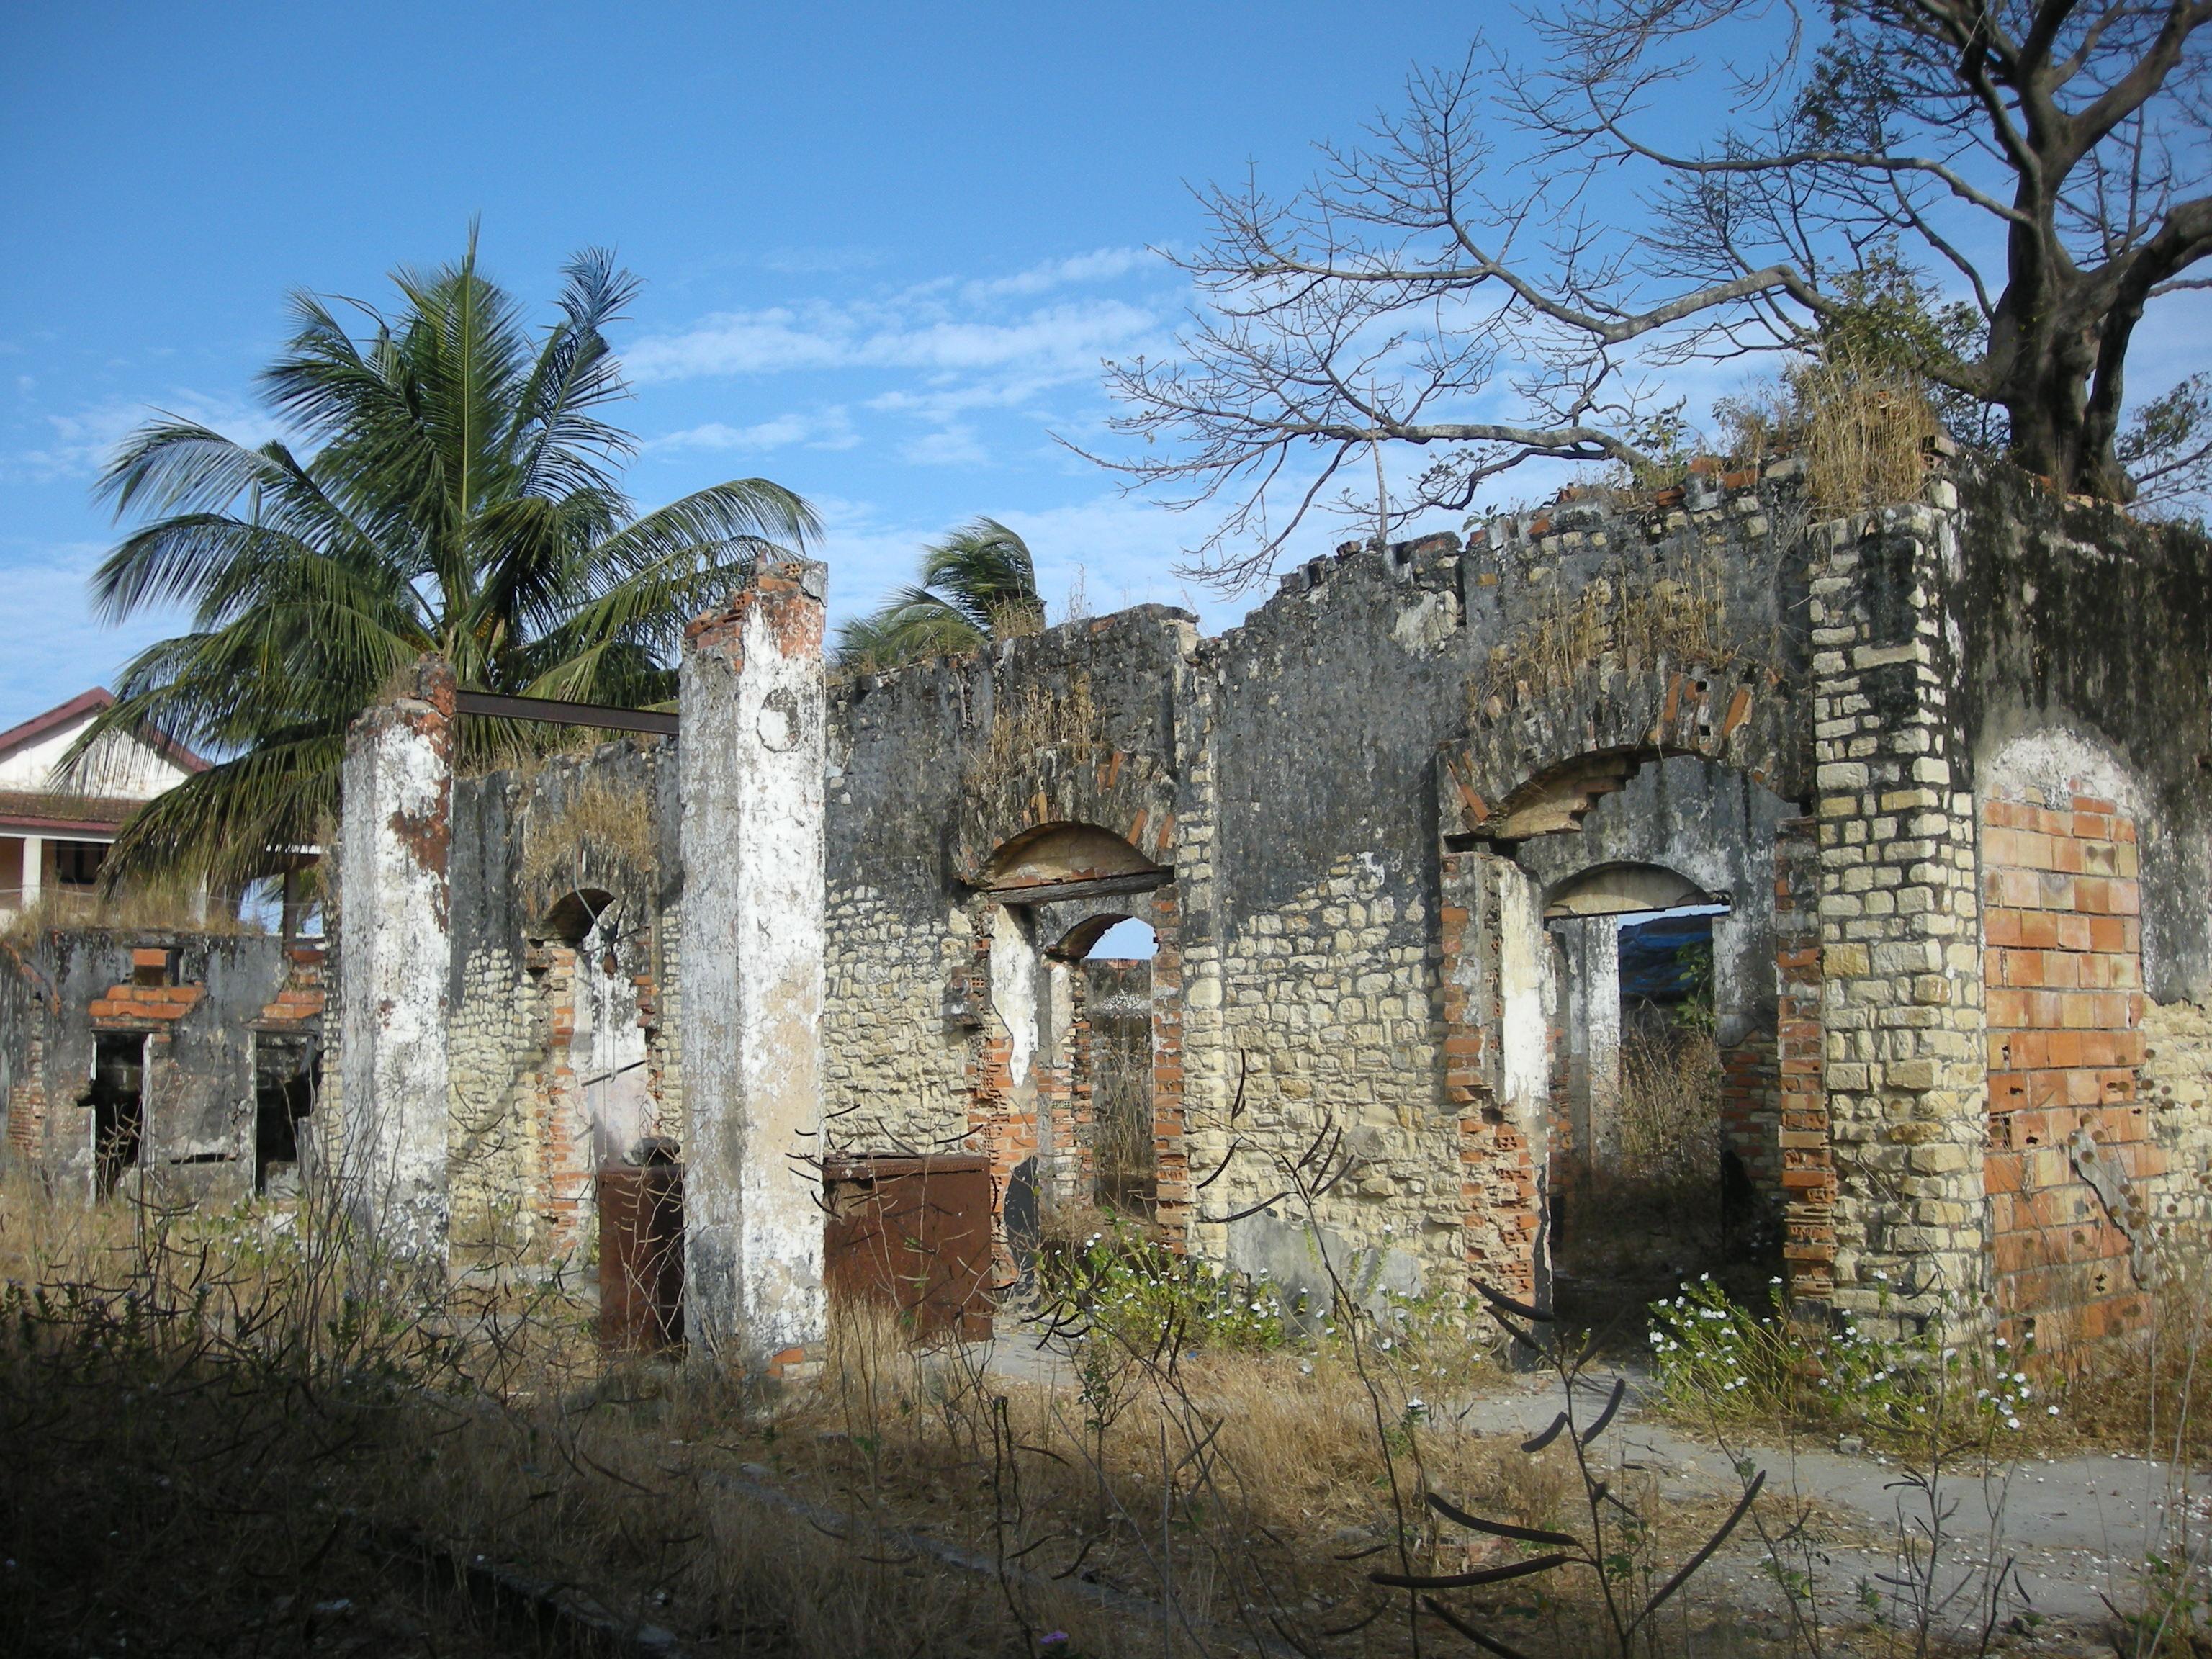 Acheter Une Maison Au Senegal Dakar Of Carabane